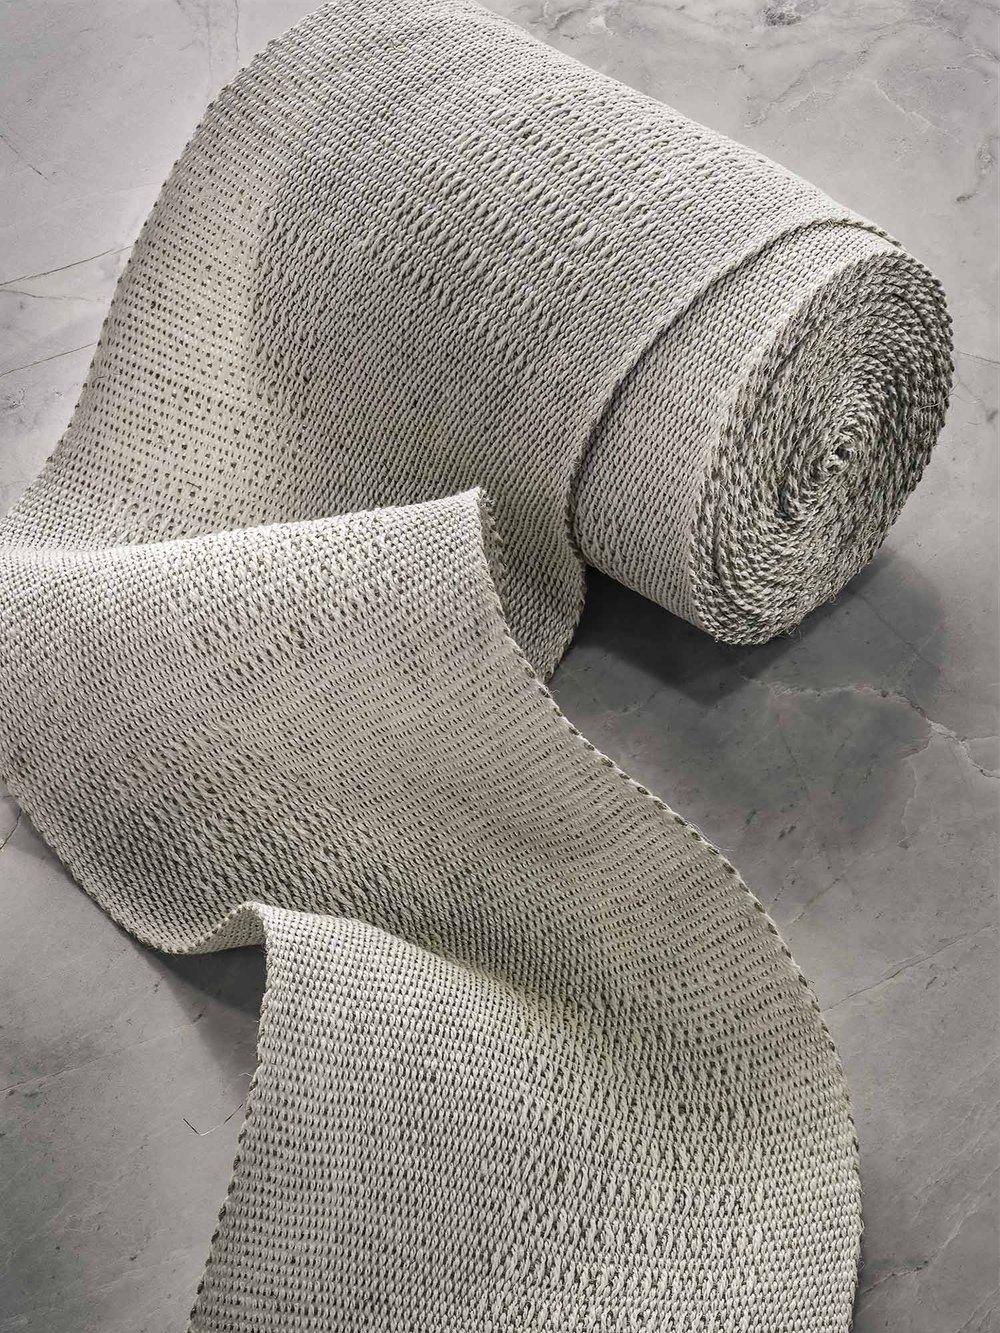 Long Blocks Handwoven Linen Tape, Wide